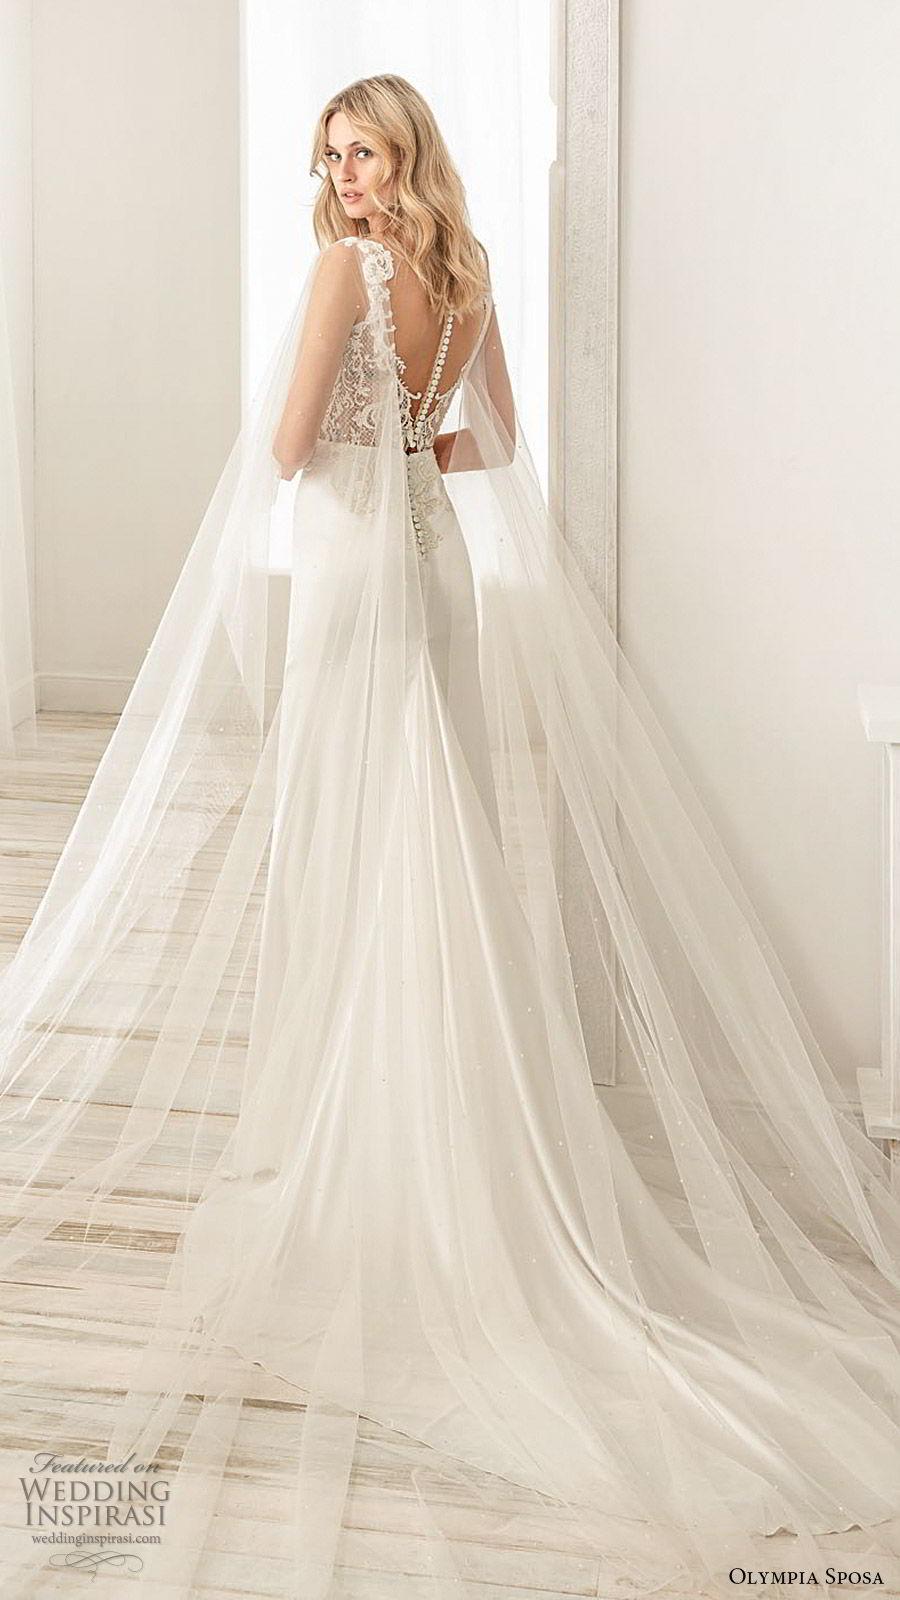 olympia sposa 2020 bridal illusion flutter sleeves sweetheart neckline embellished bodice sheath wedding dress (7) elegant romantic illusion back chapel train bv